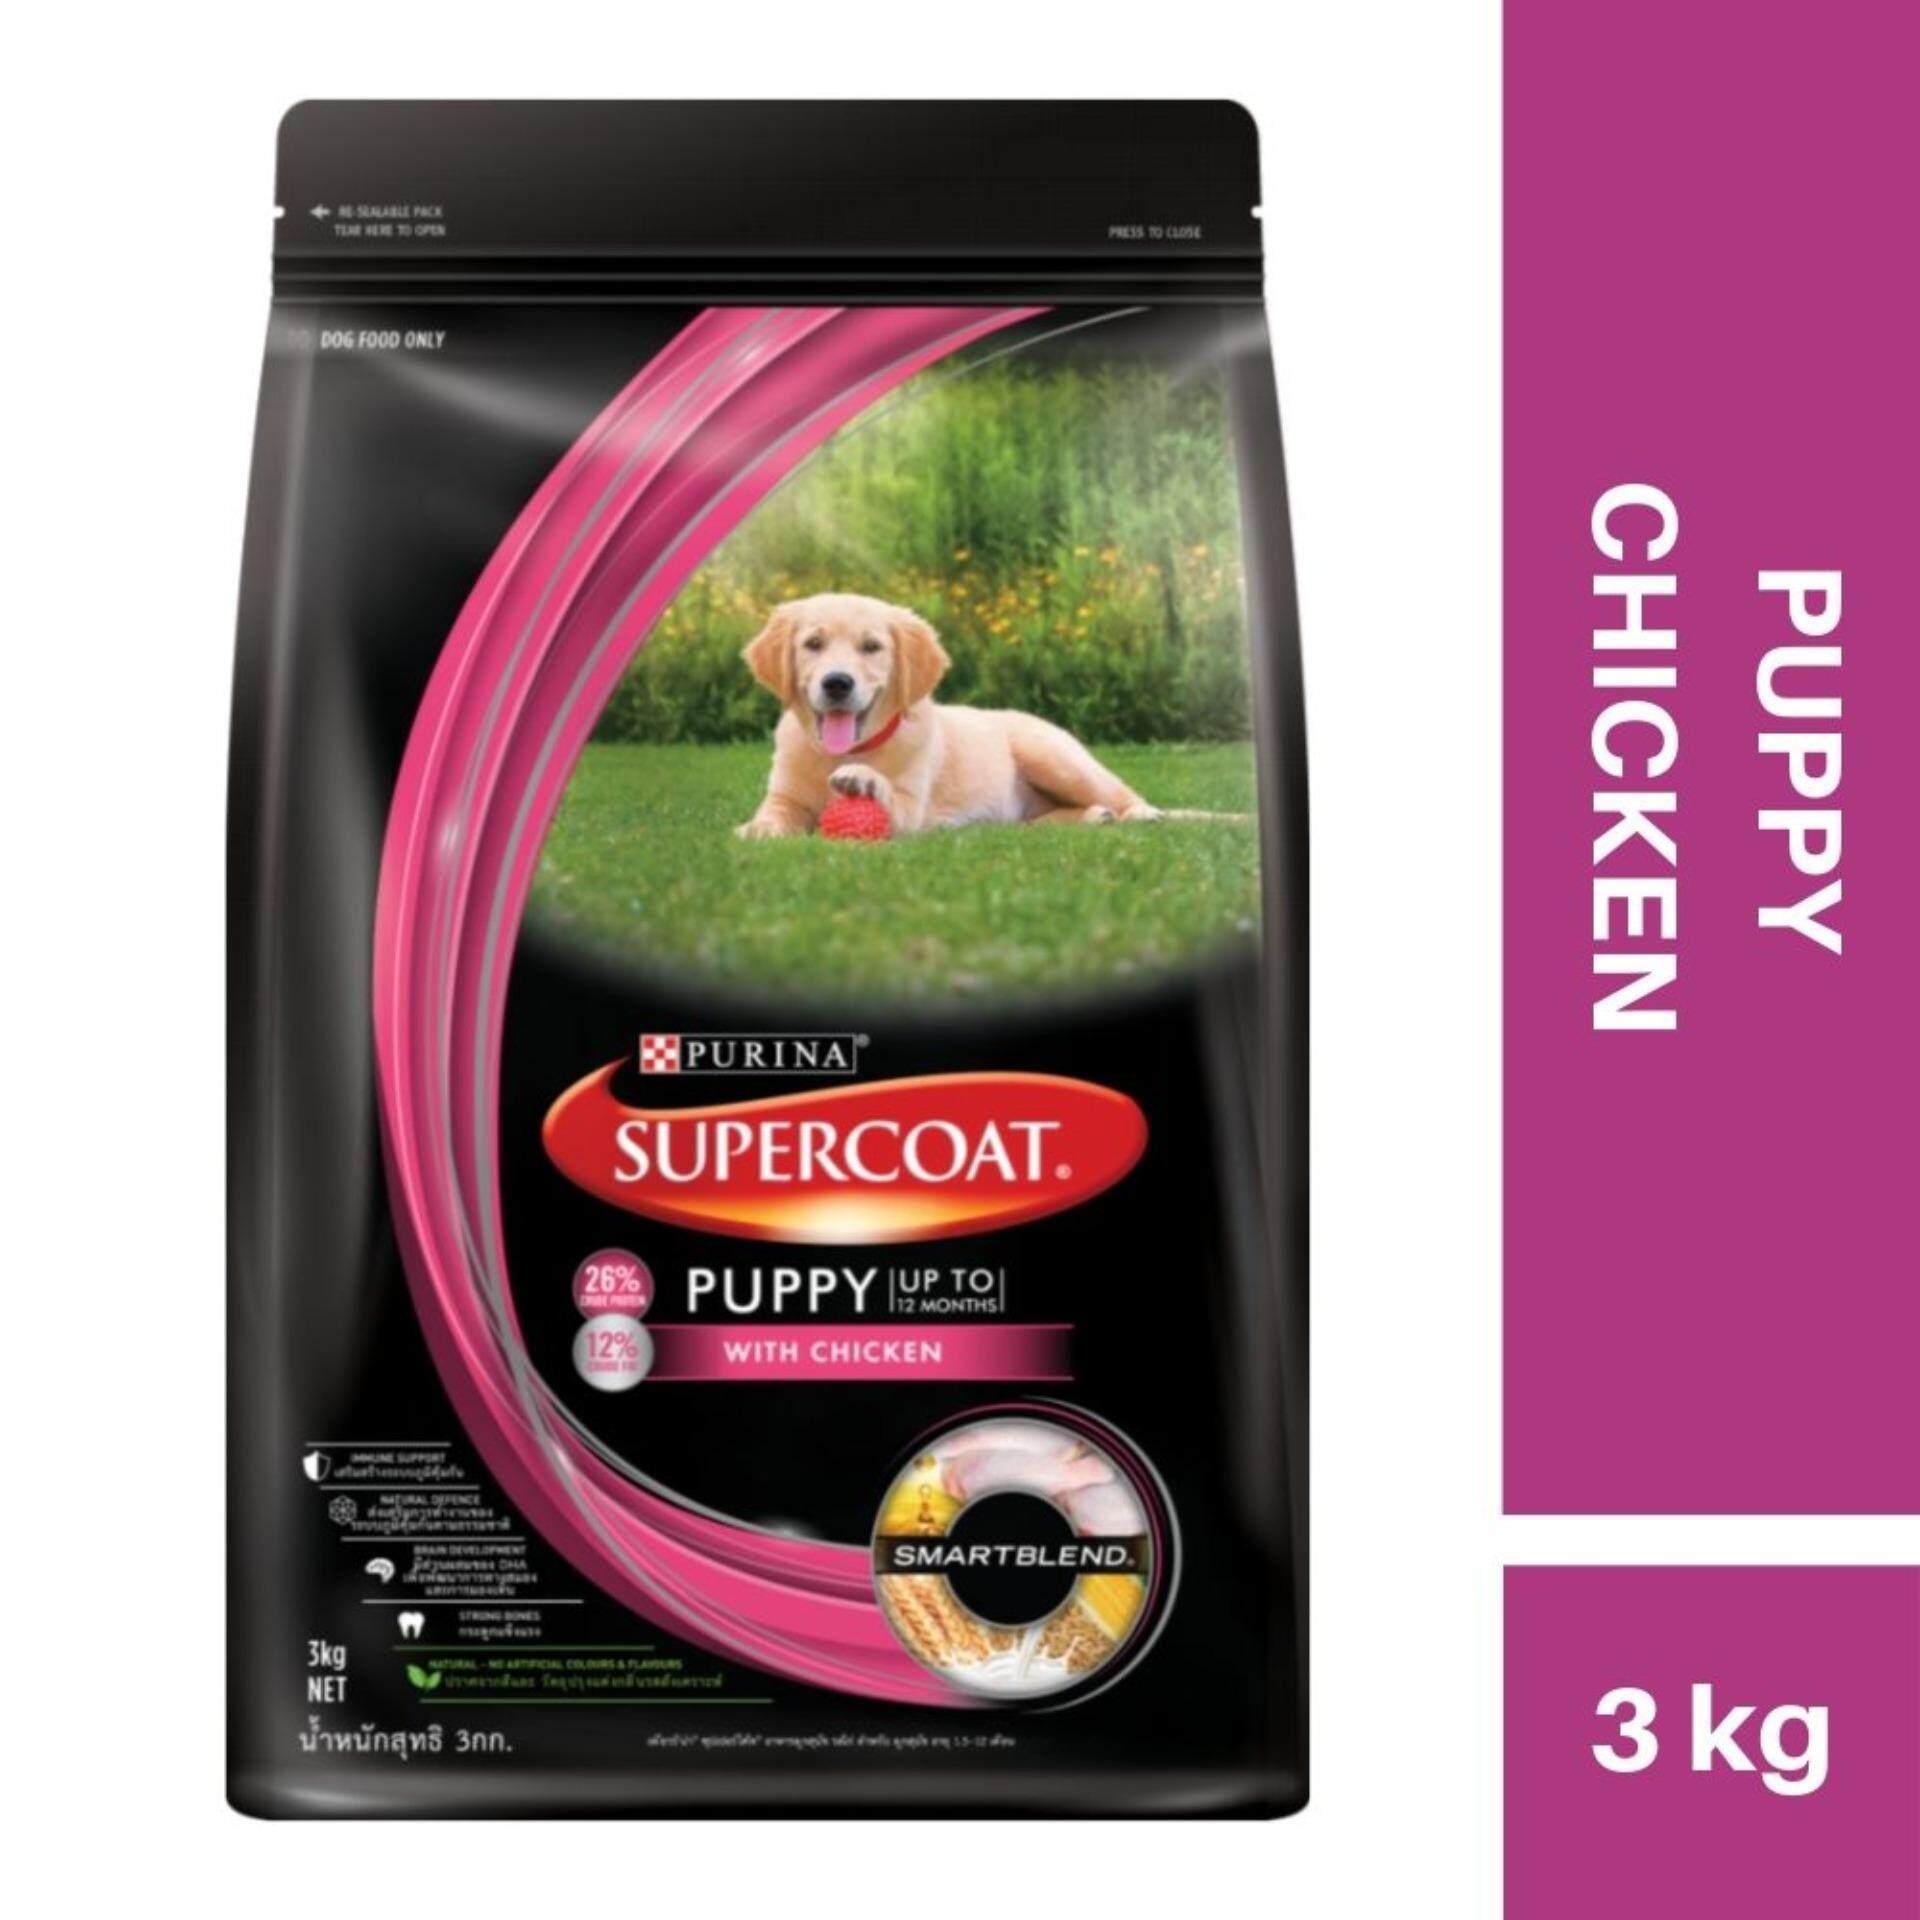 SUPERCOAT PUPPY FOOD Chicken 3kg - Pet Food/ Dry Food/ Dog Food/ Makanan Anjing